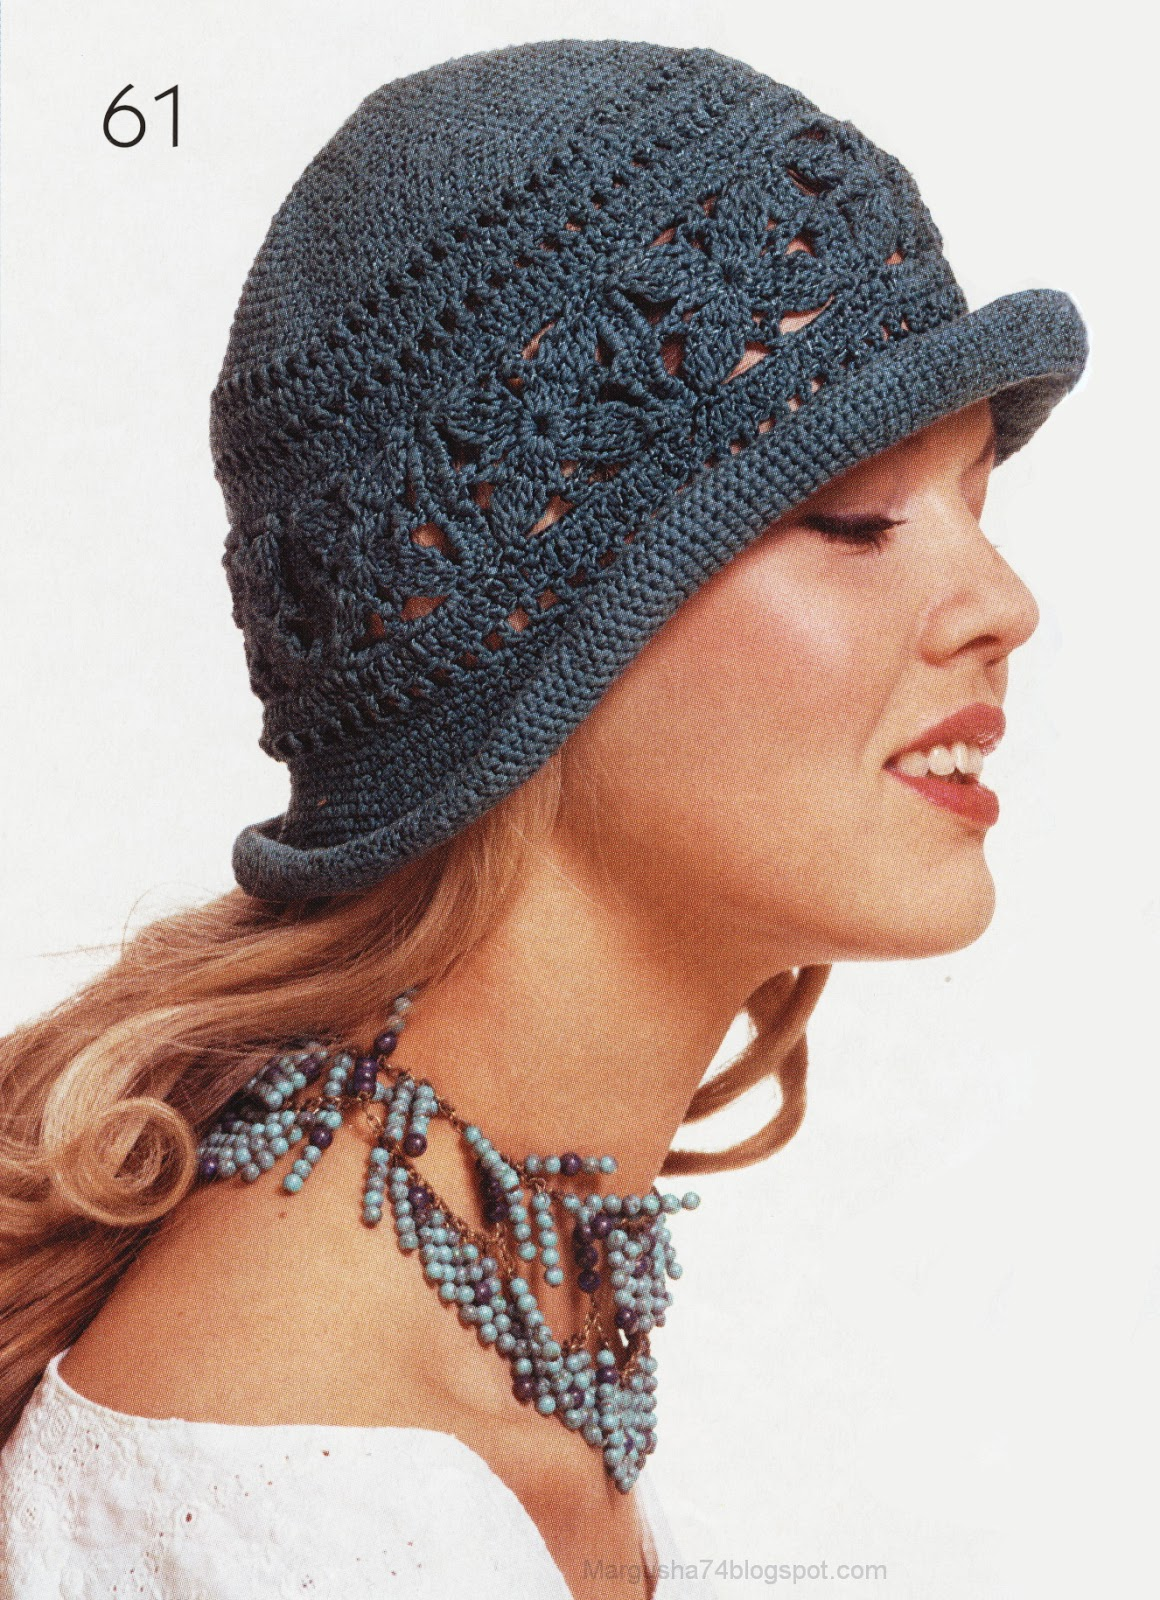 Связать шапку спицами  woman7ru